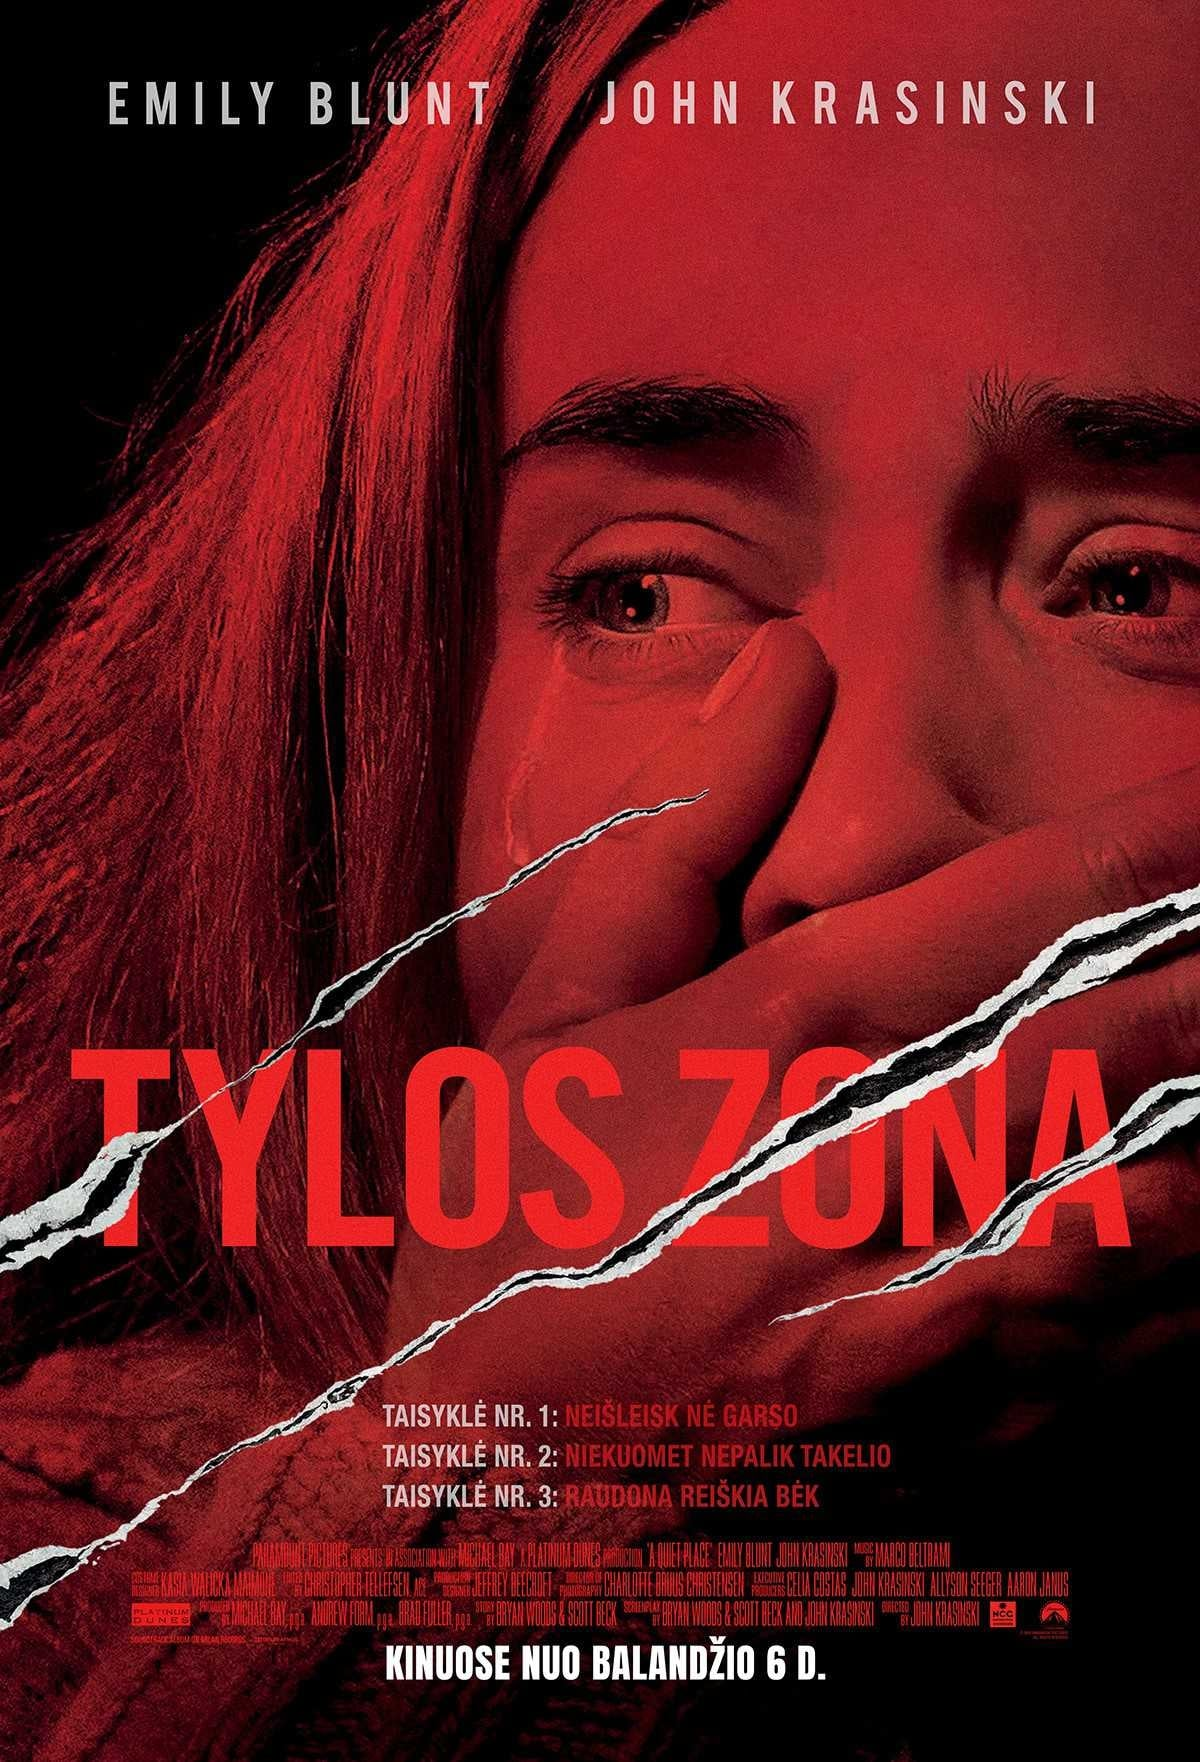 Tylos zona / A Quiet Place (2018) žiūrėti online